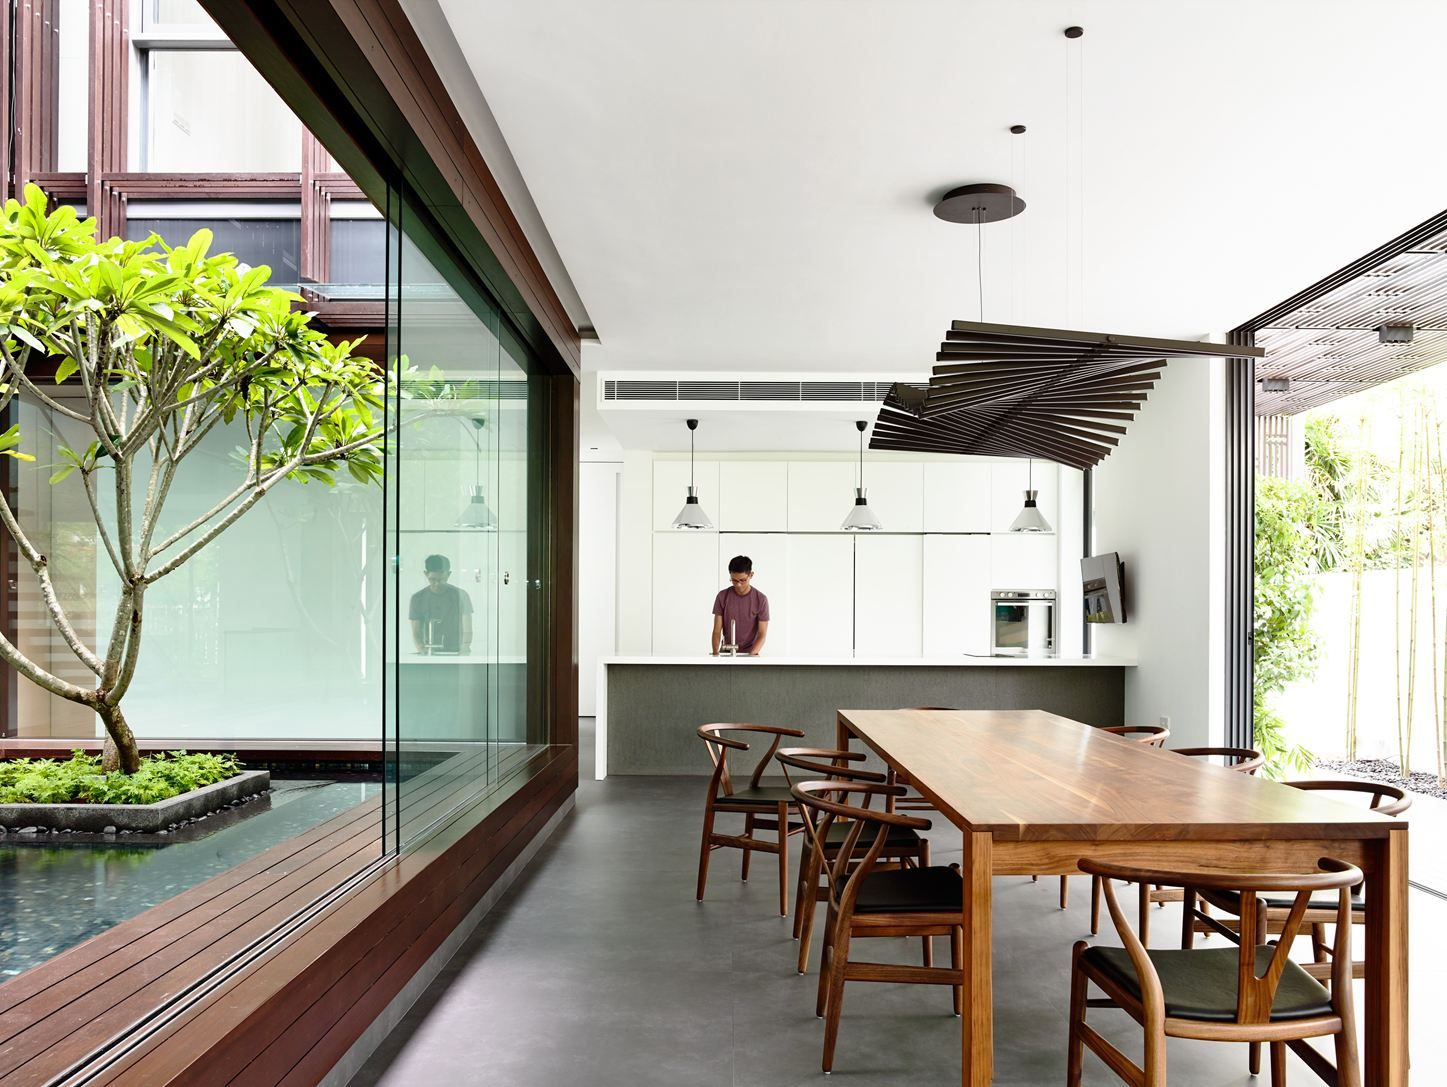 Best De Eetkamer Borne Images - Modern Design Ideas ...